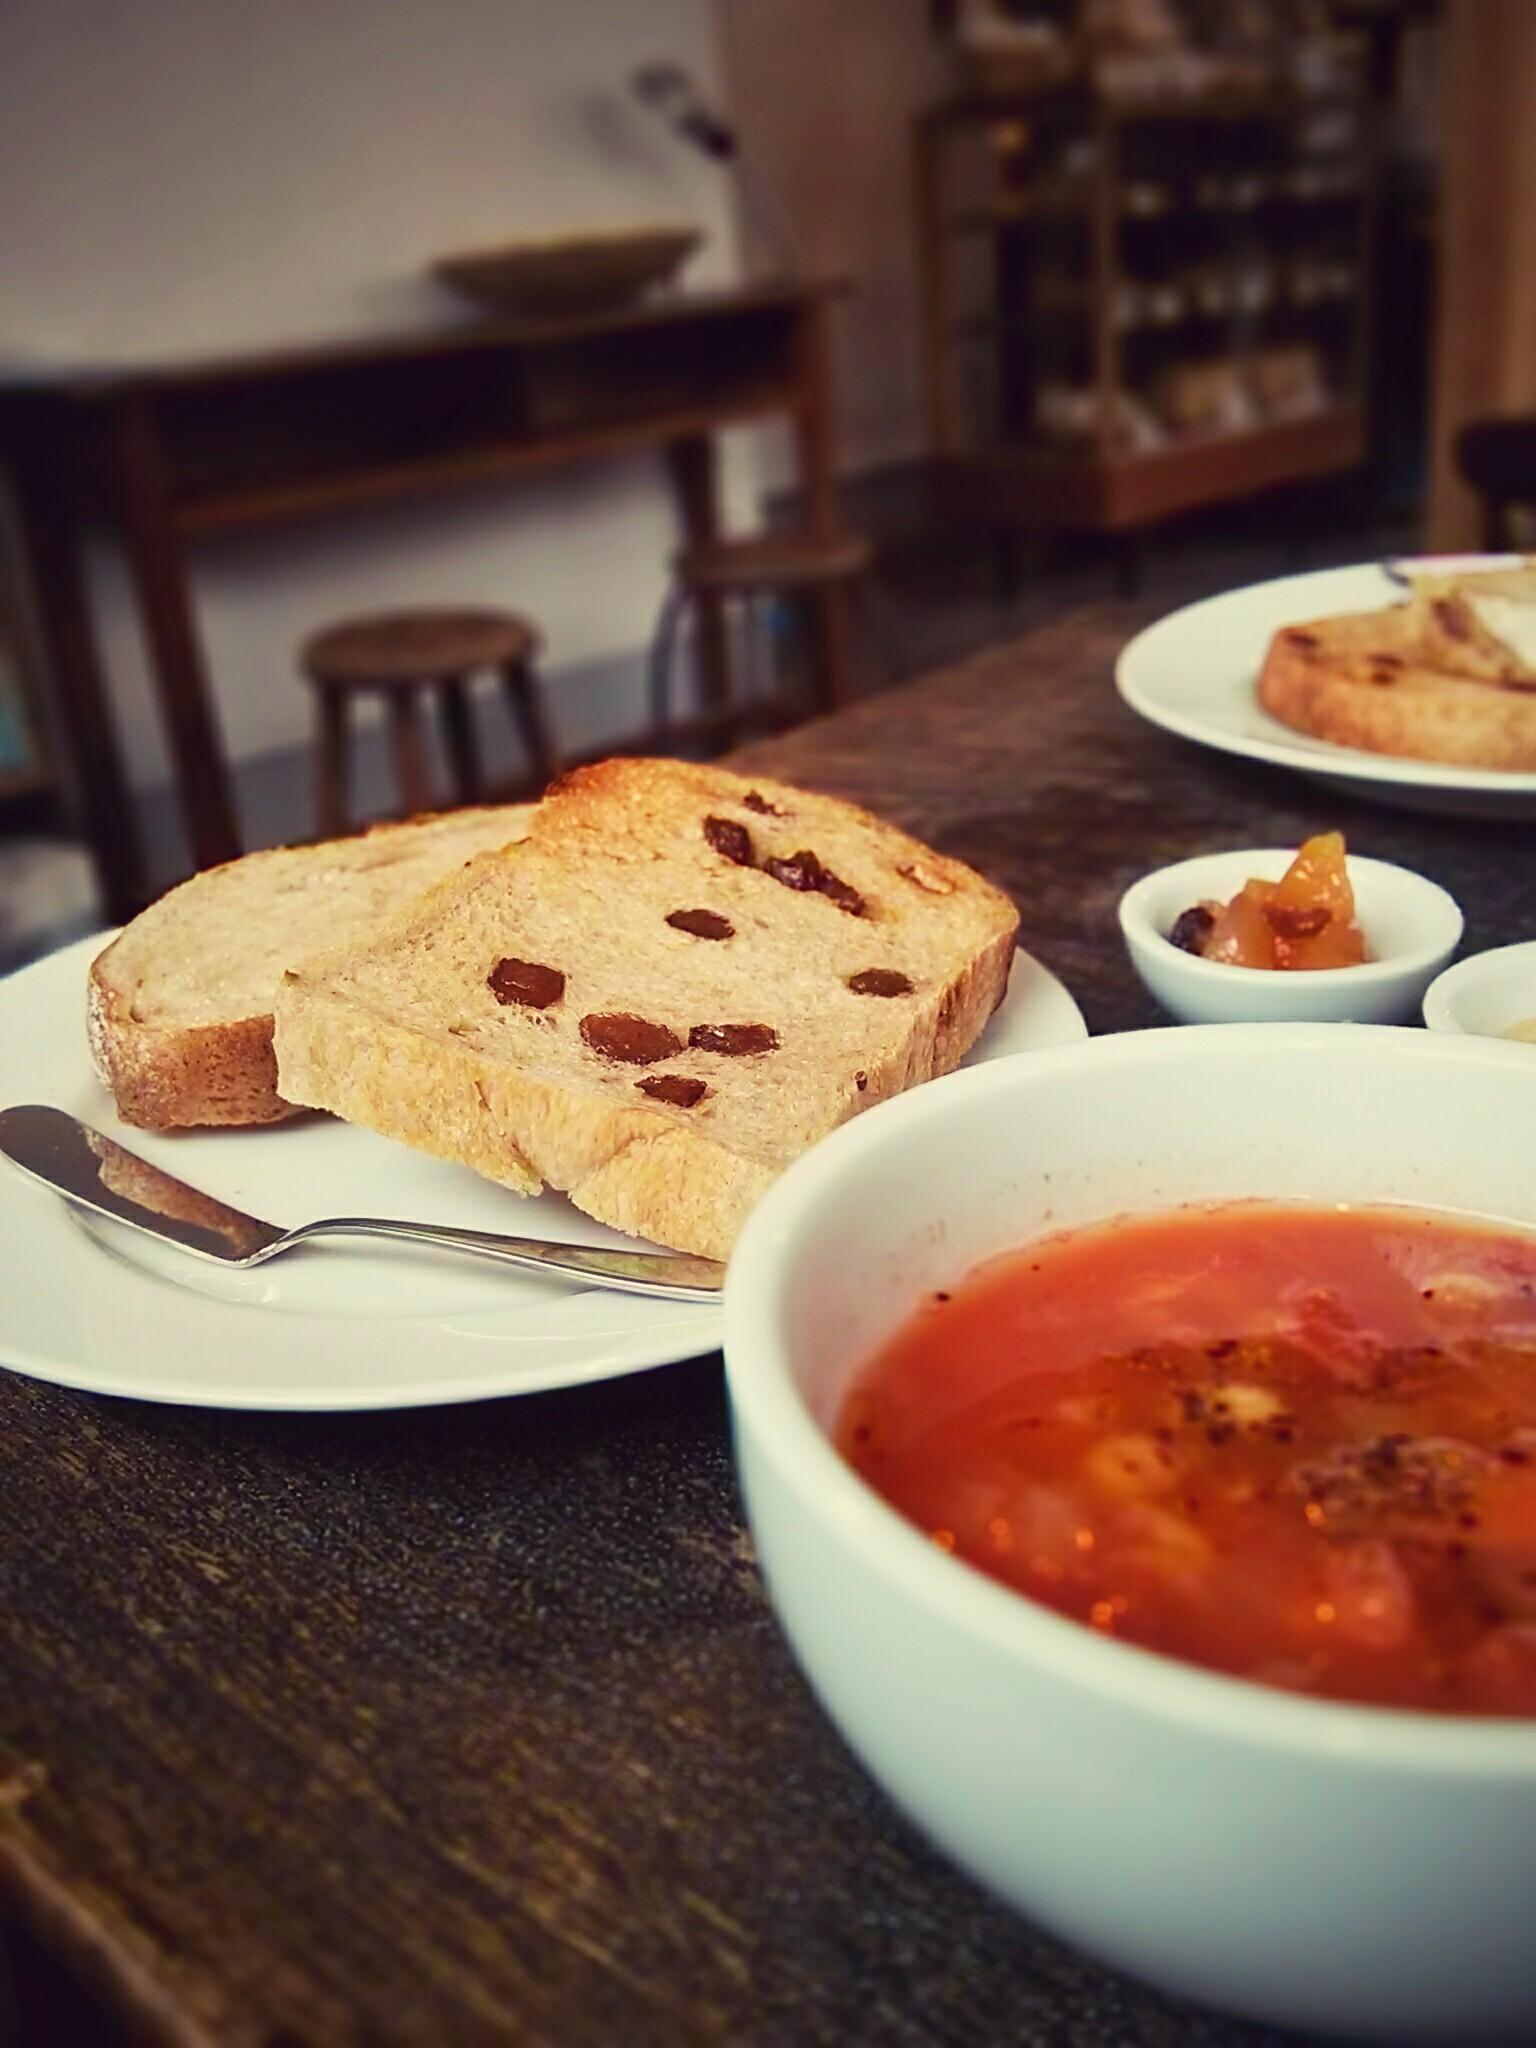 『Blatt(ブラット)』 大森台駅の天然酵母パンが人気のベーカリーカフェ